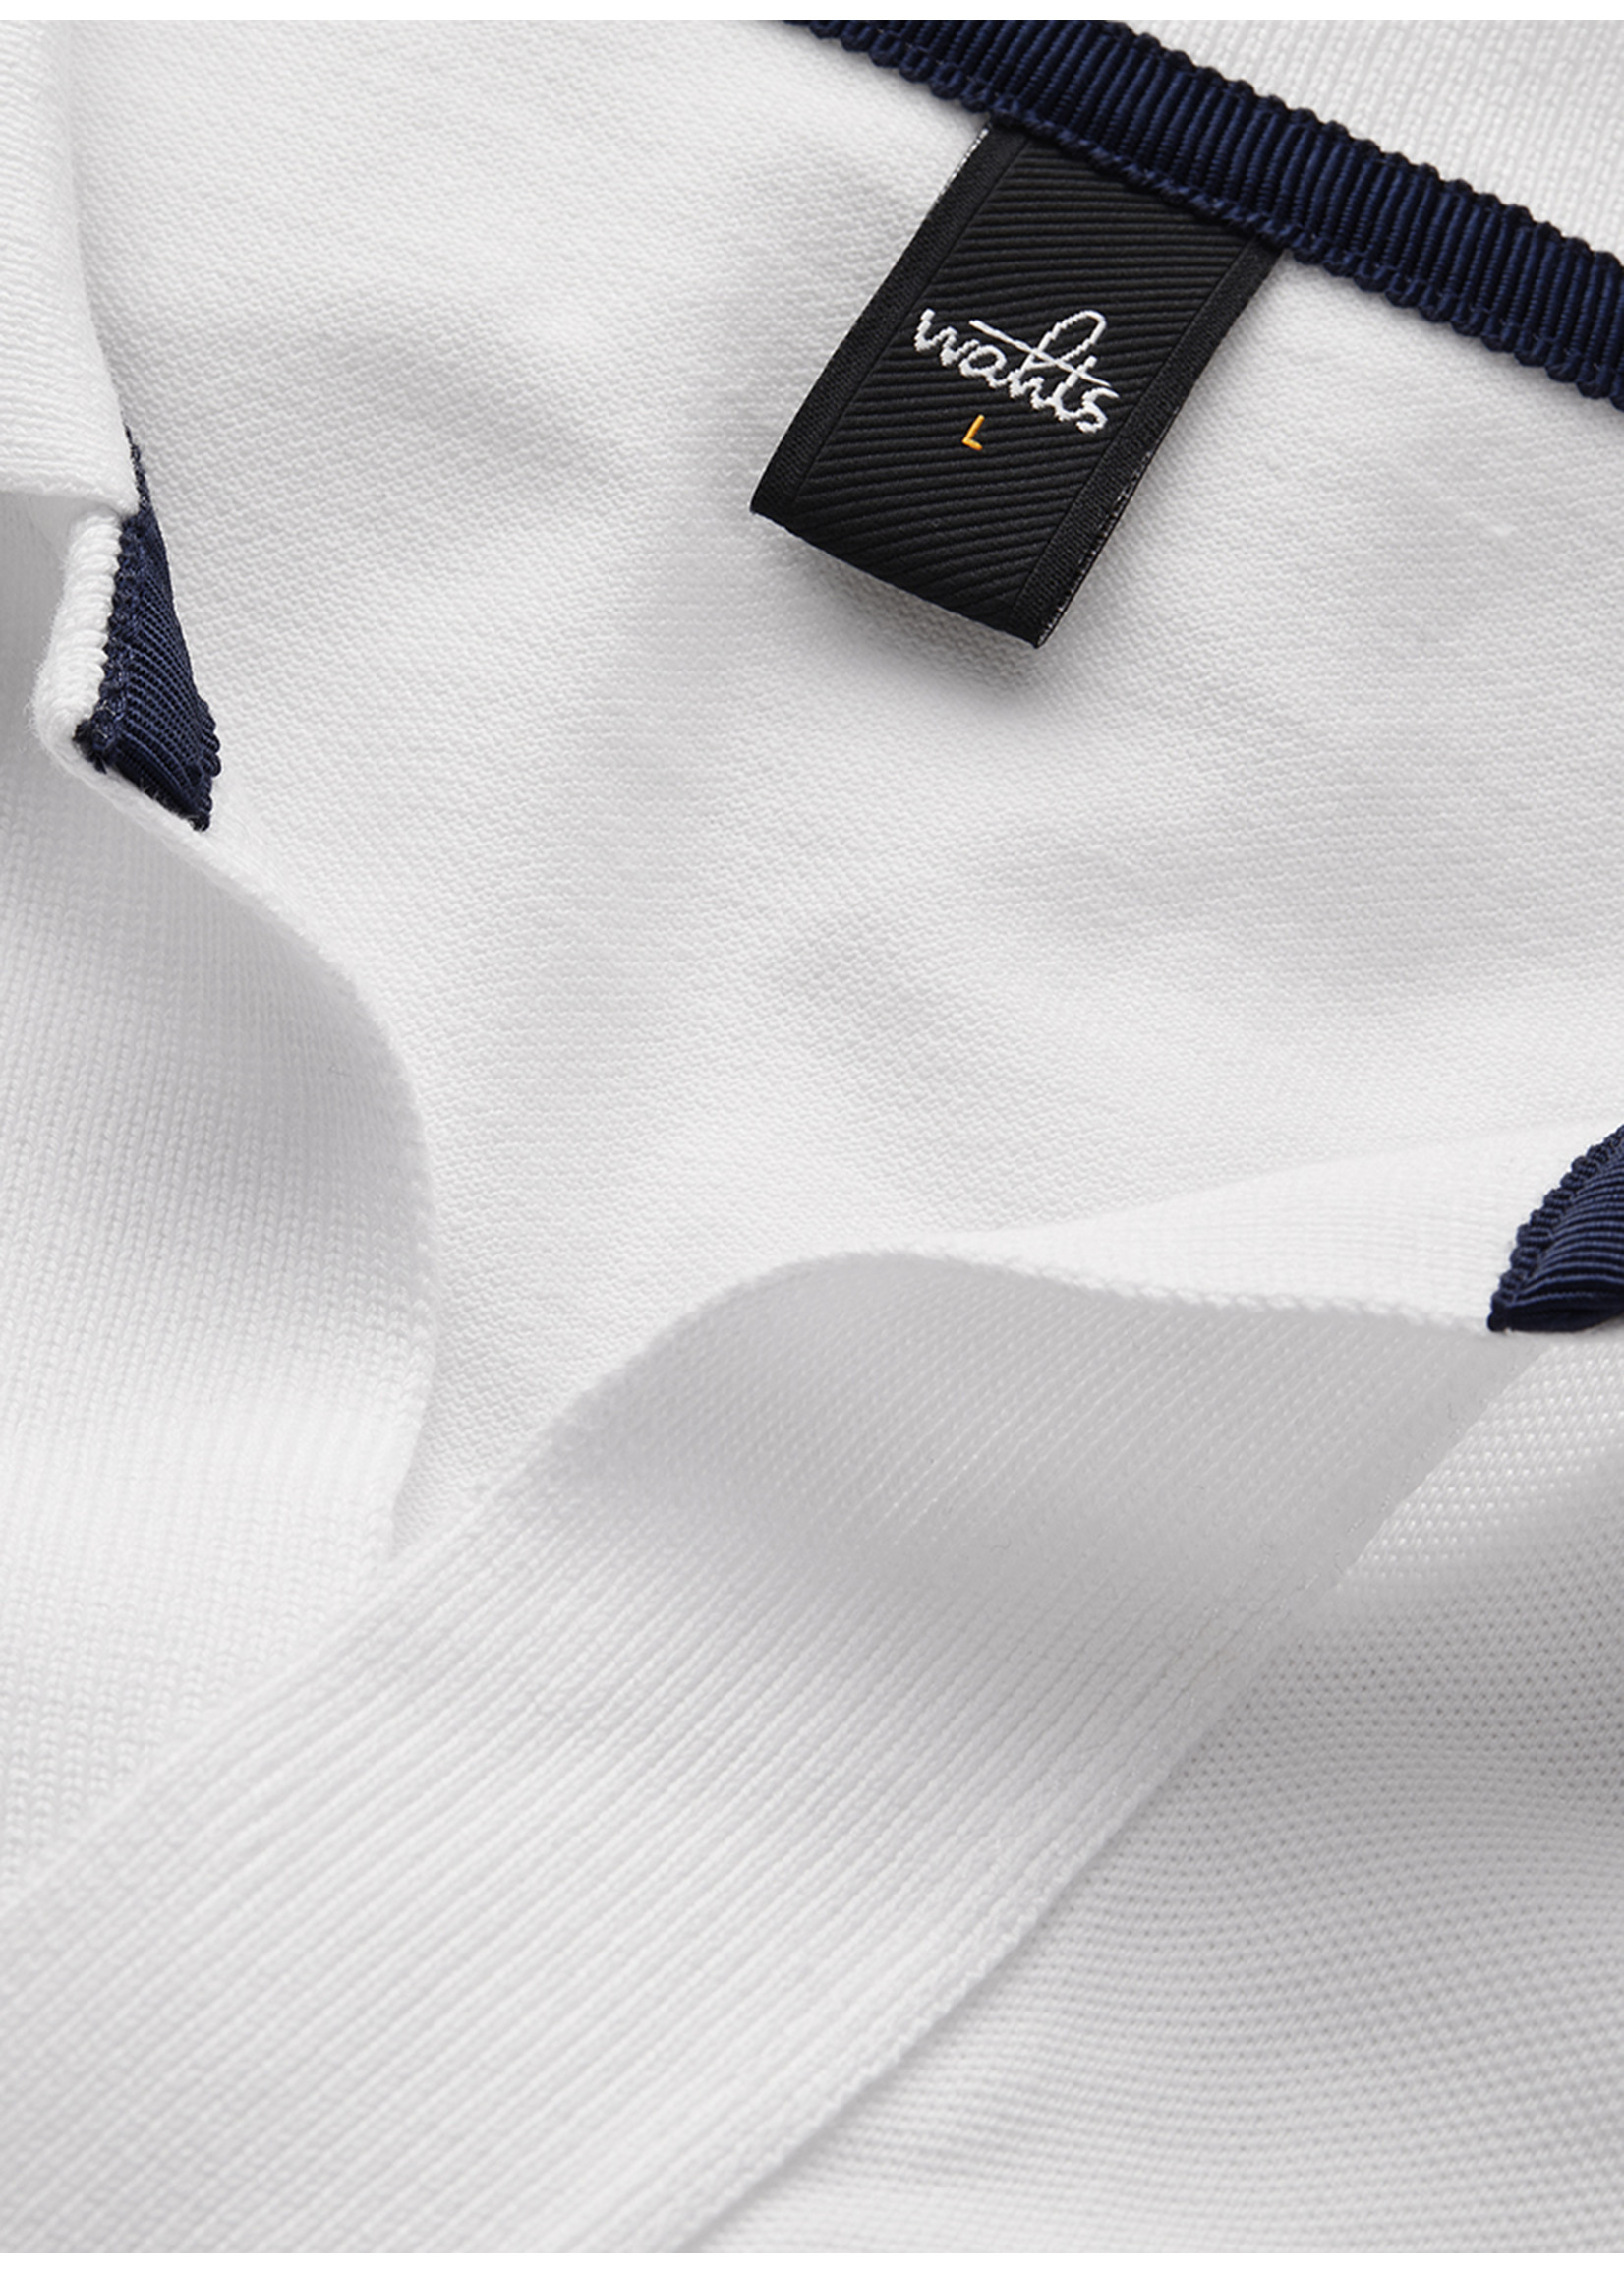 Wahts Rice retro polo shirt pure white